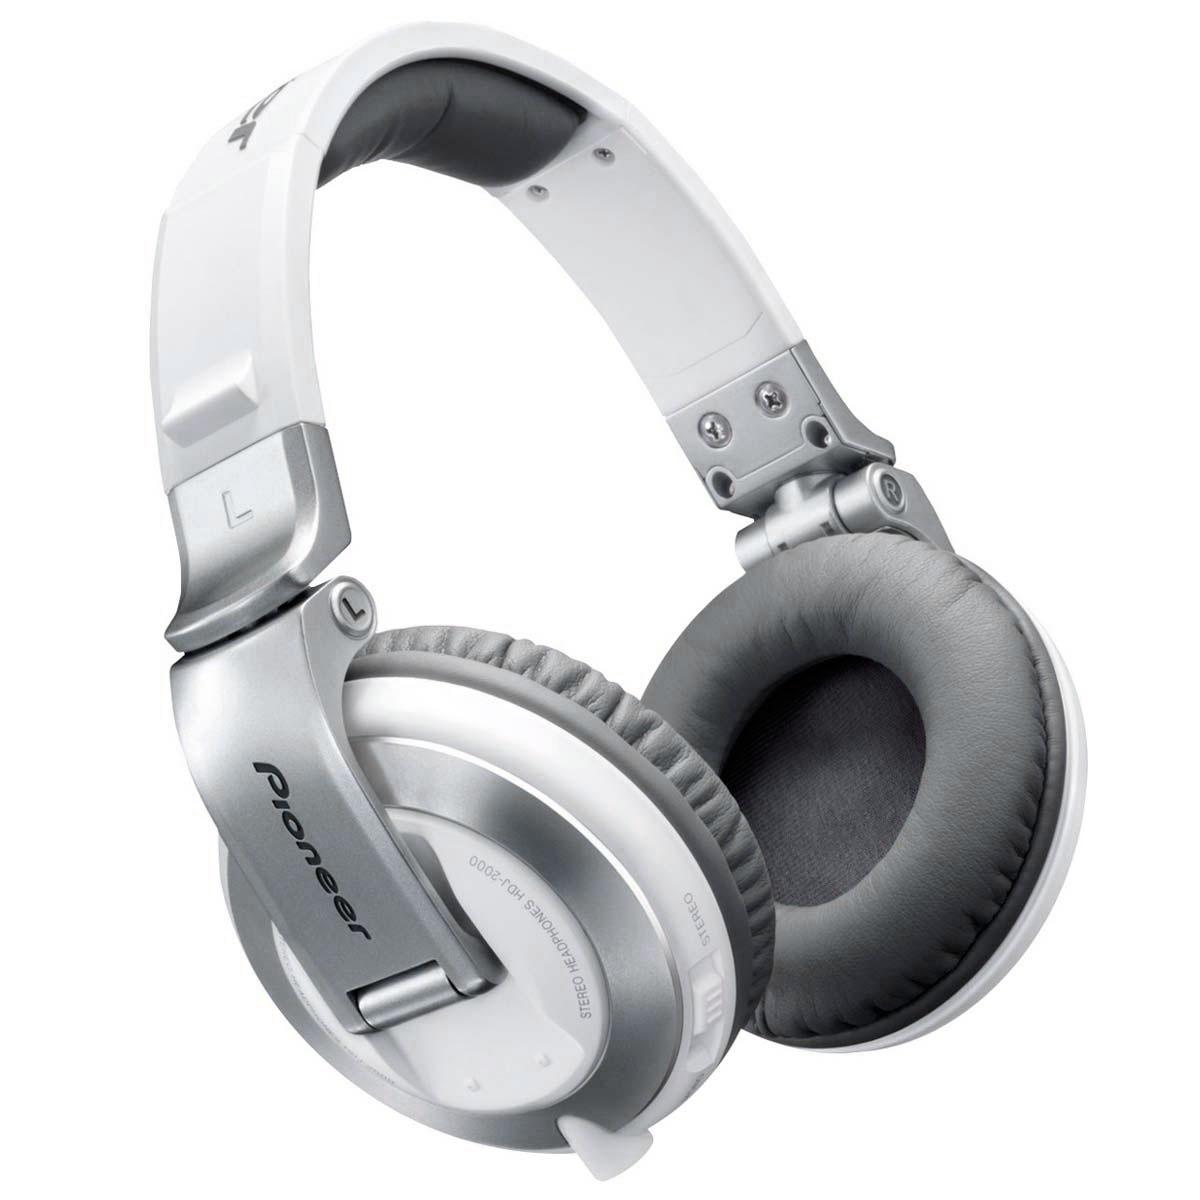 Fone de Ouvido Over-ear p/ DJ 5Hz - 30KHz 36 Ohms - HDJ 2000 Pioneer